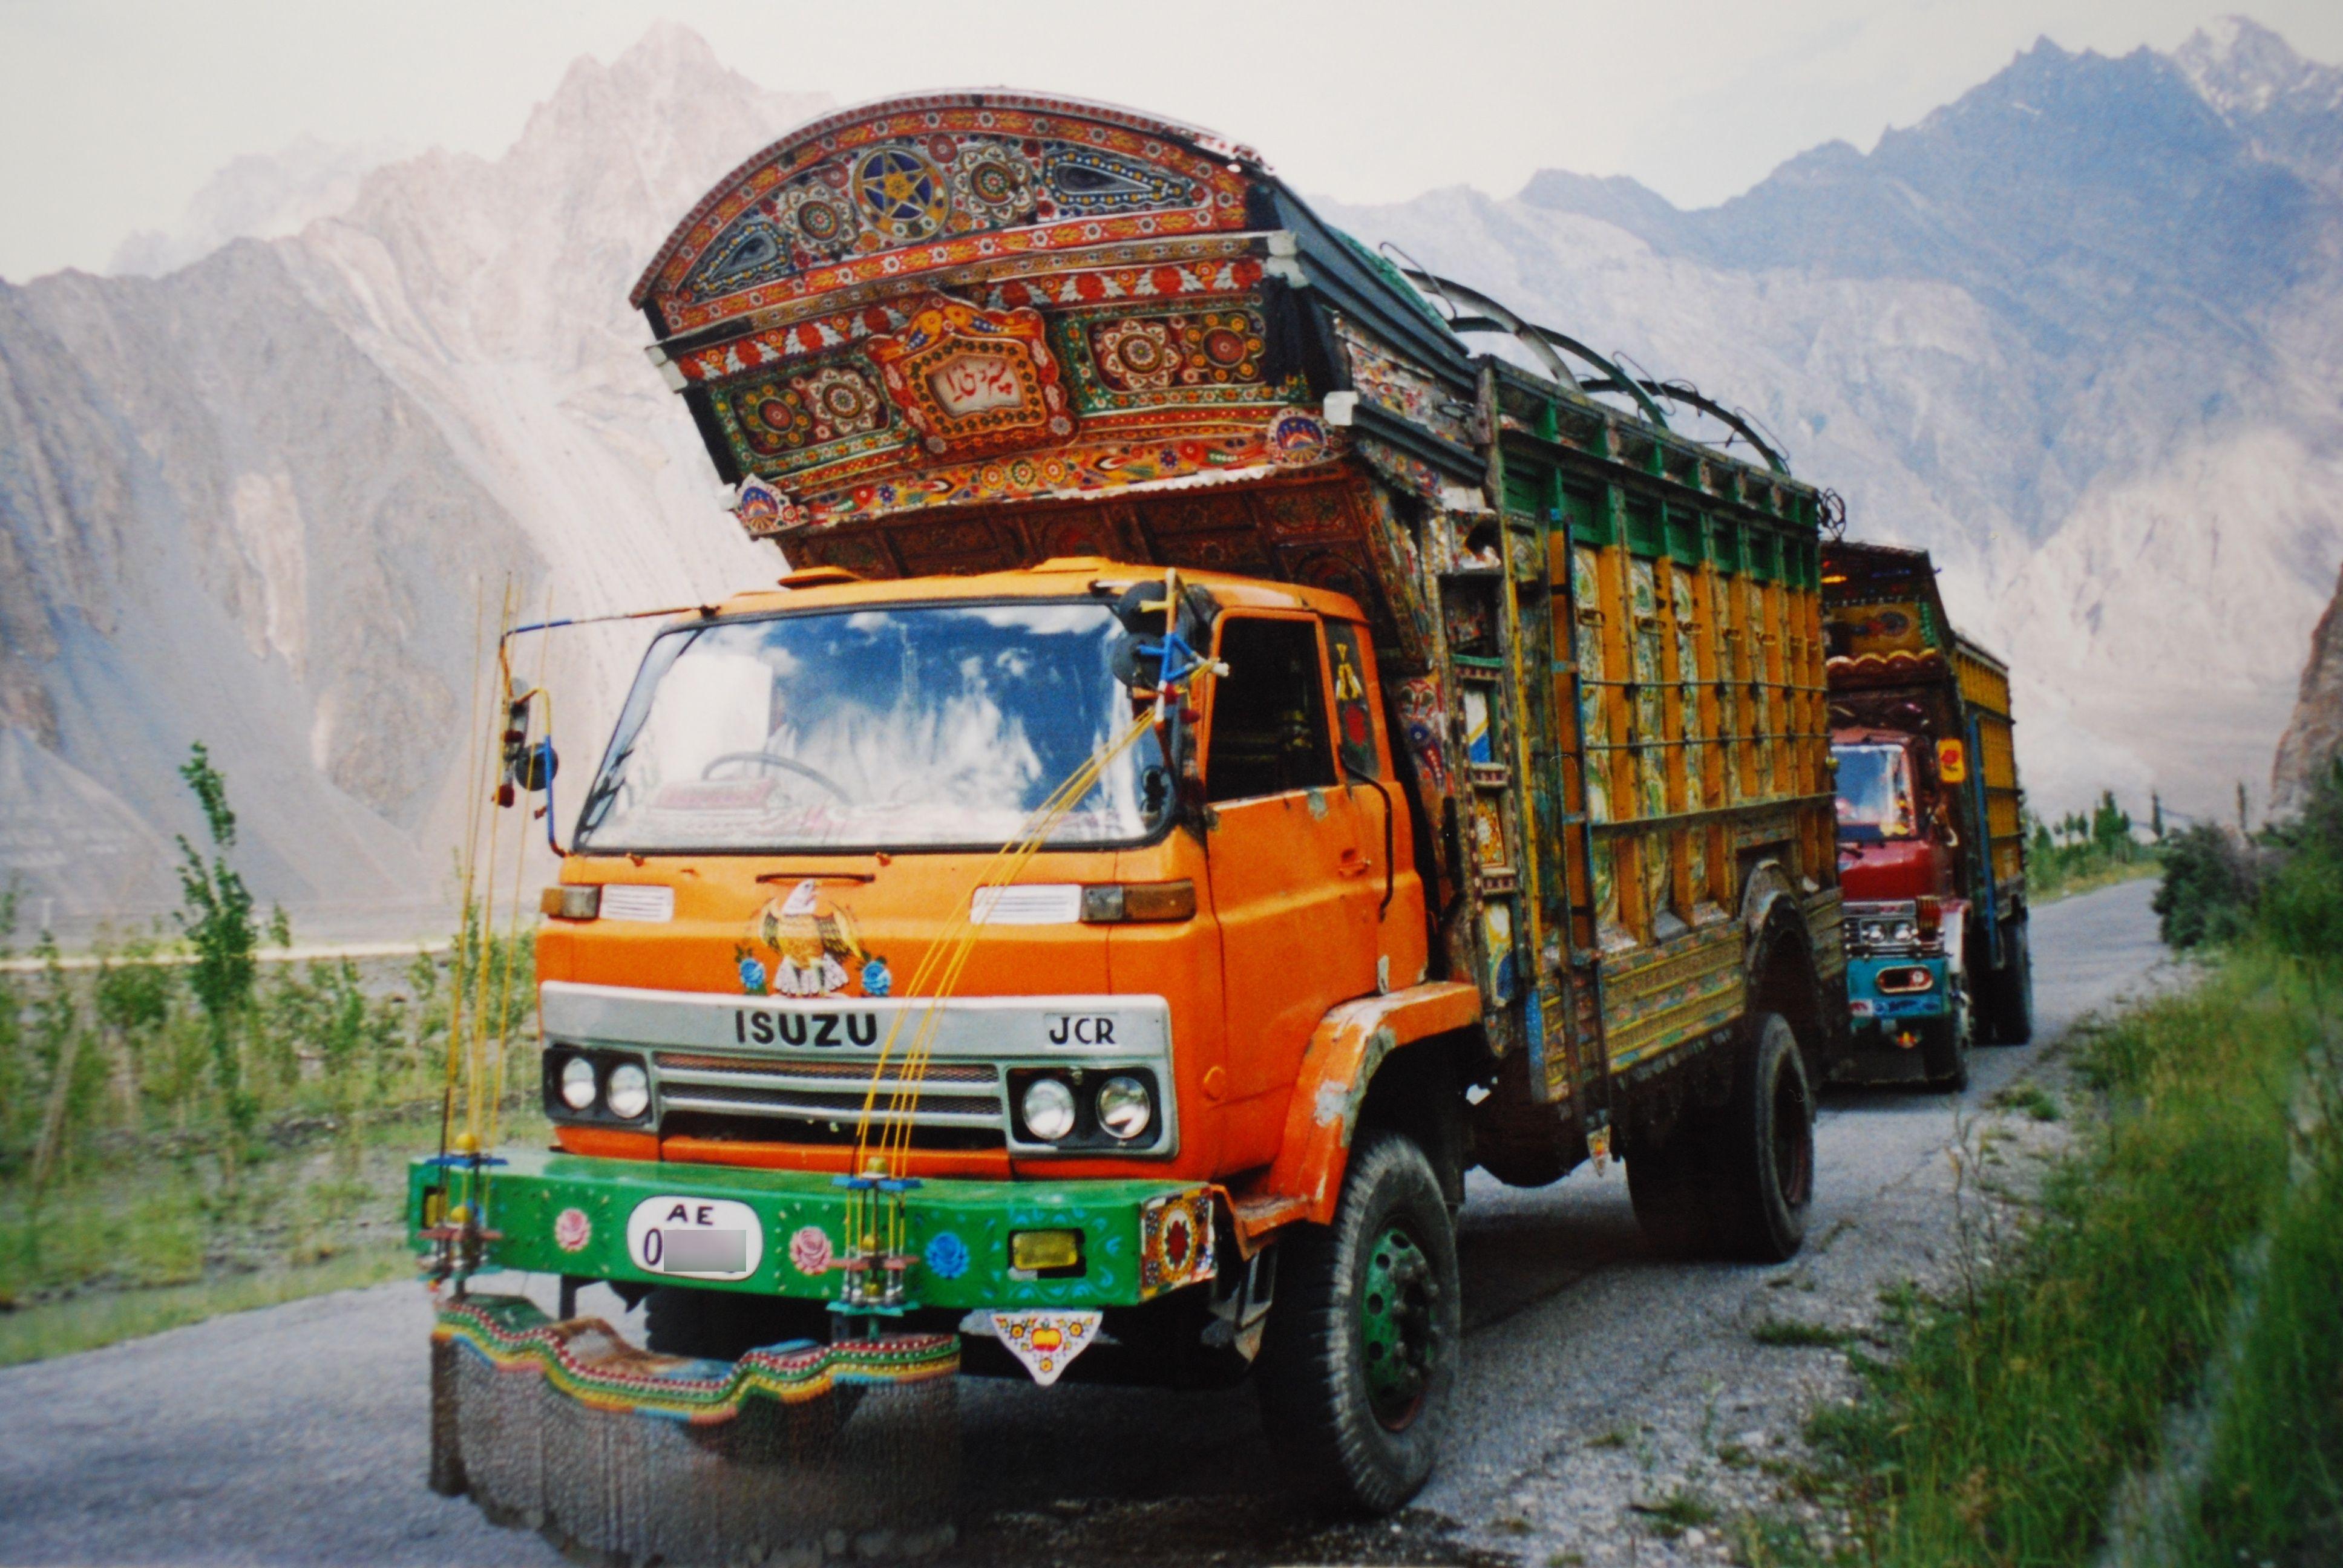 Isuzu Lorry Pakistan  Lorries  Pinterest  Trucks Large and